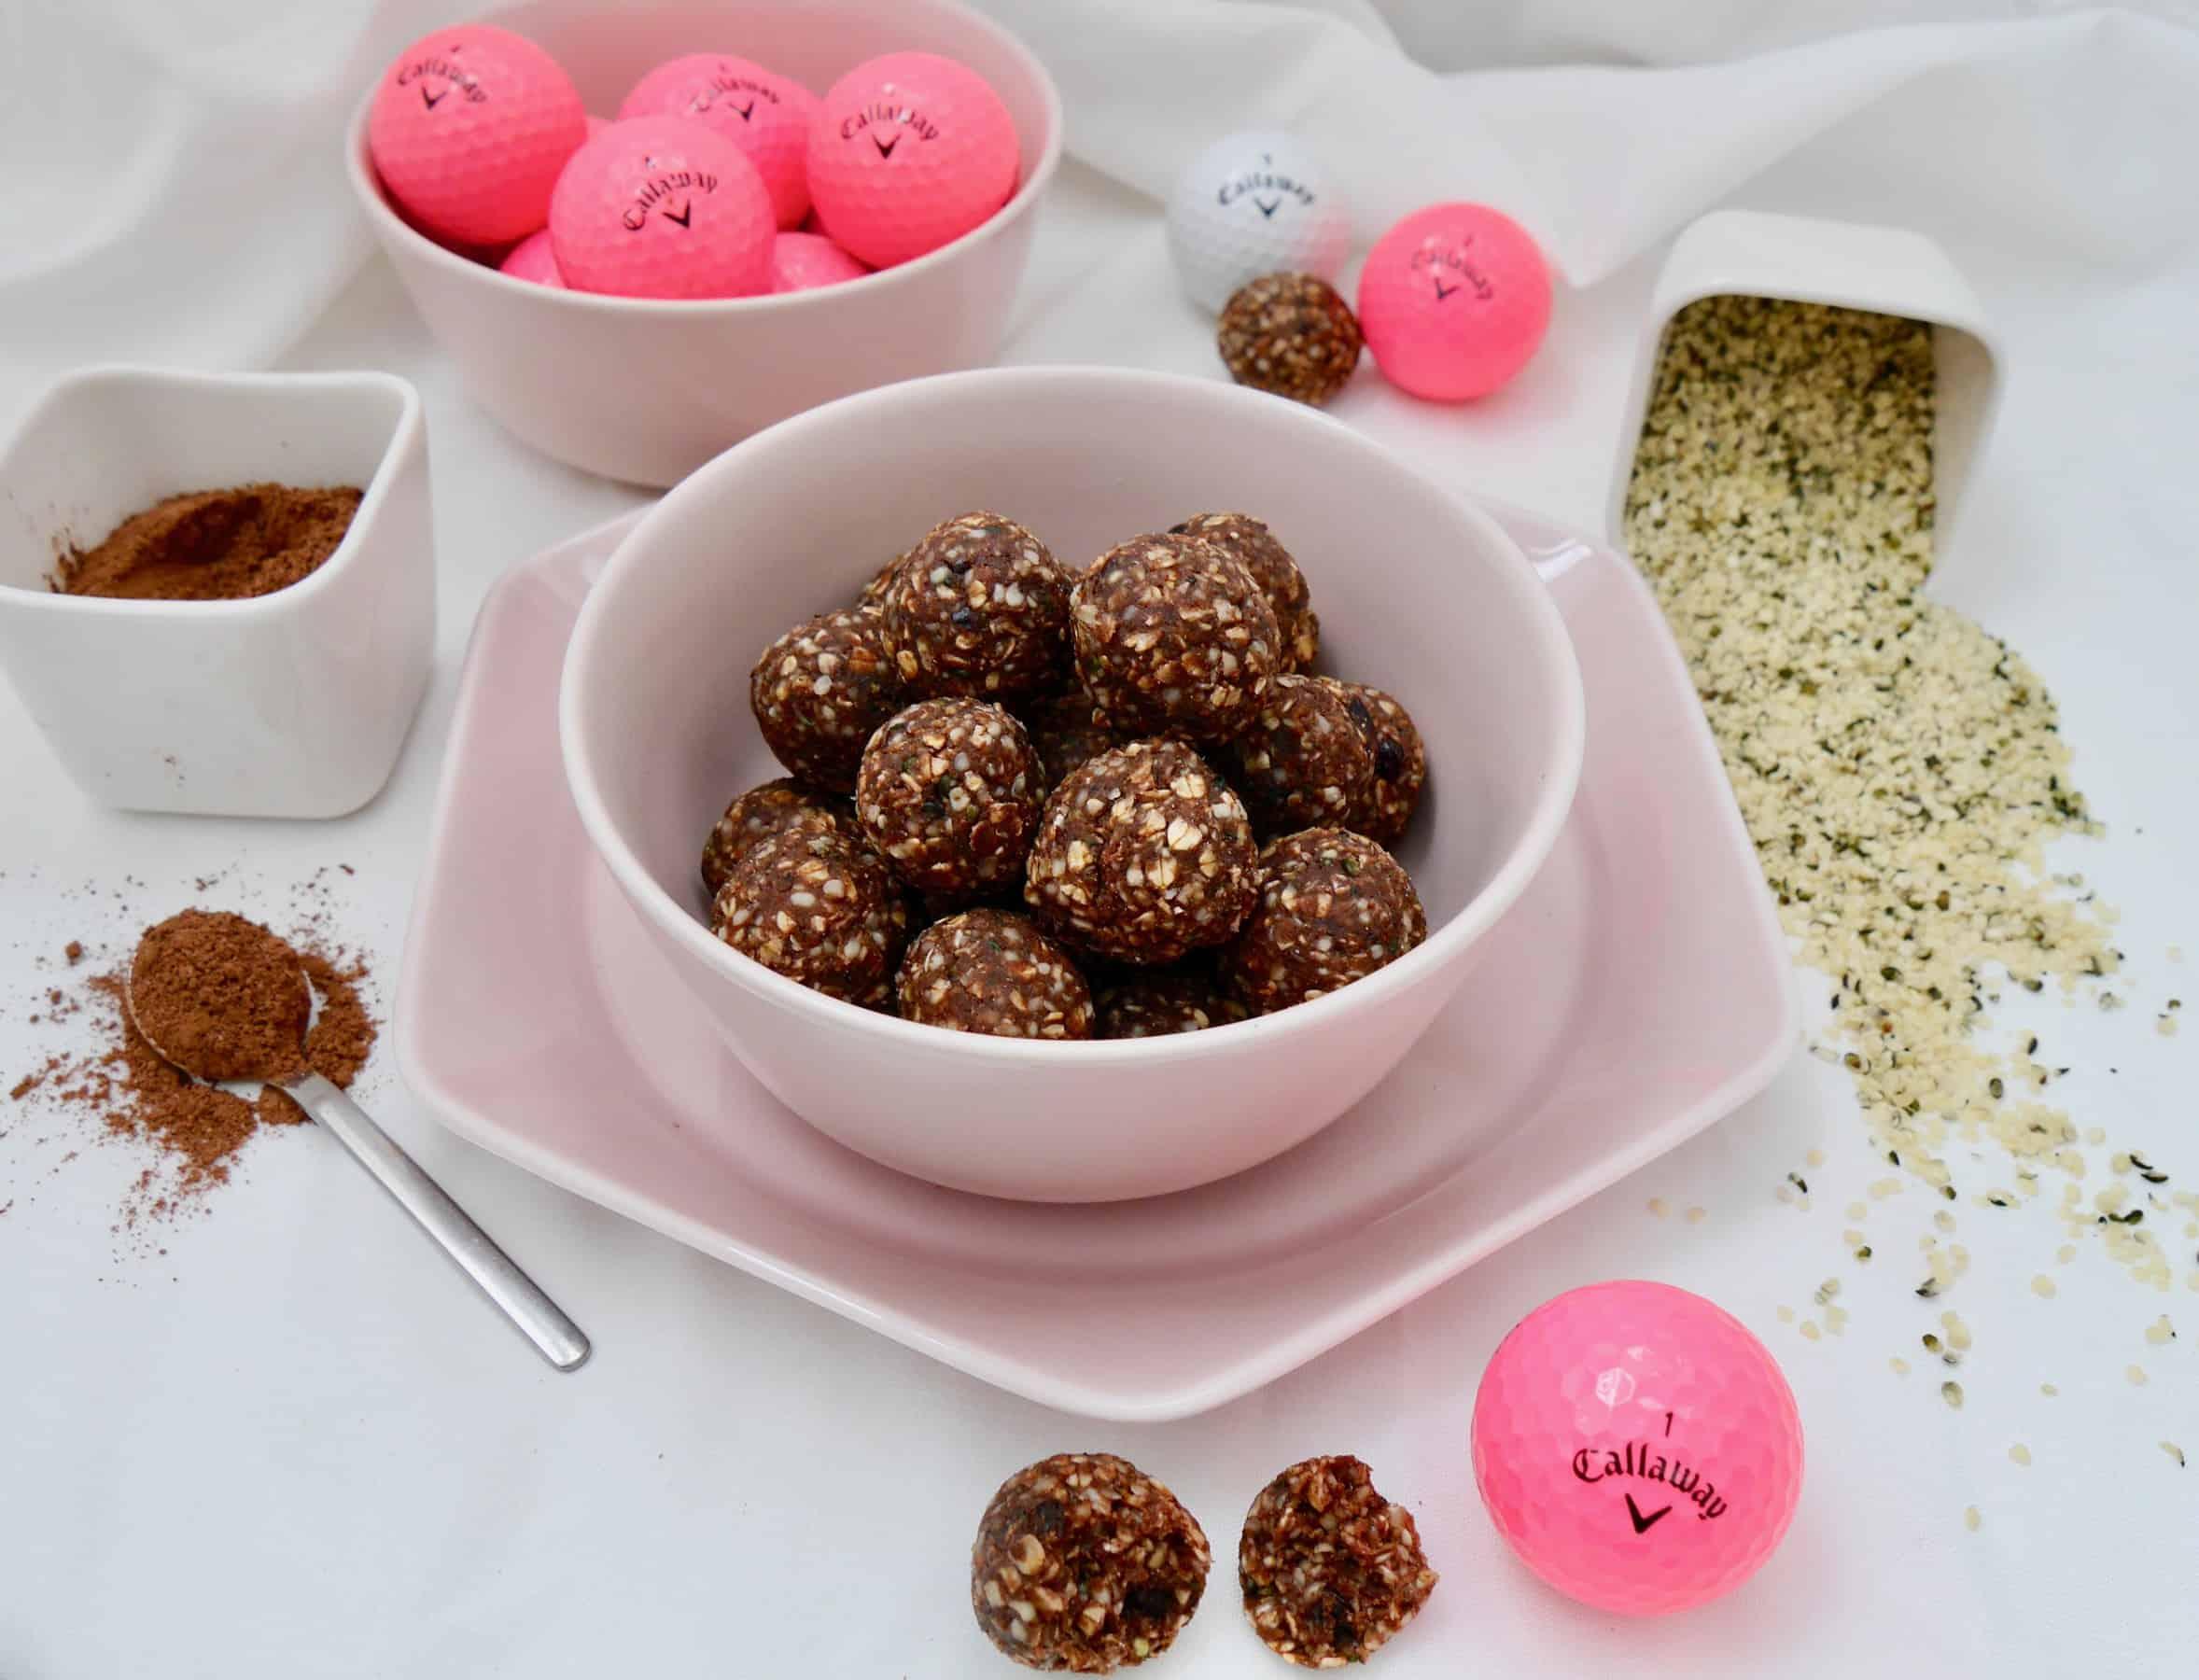 Koffein-Energyballs by Dr. Alexa Iwan